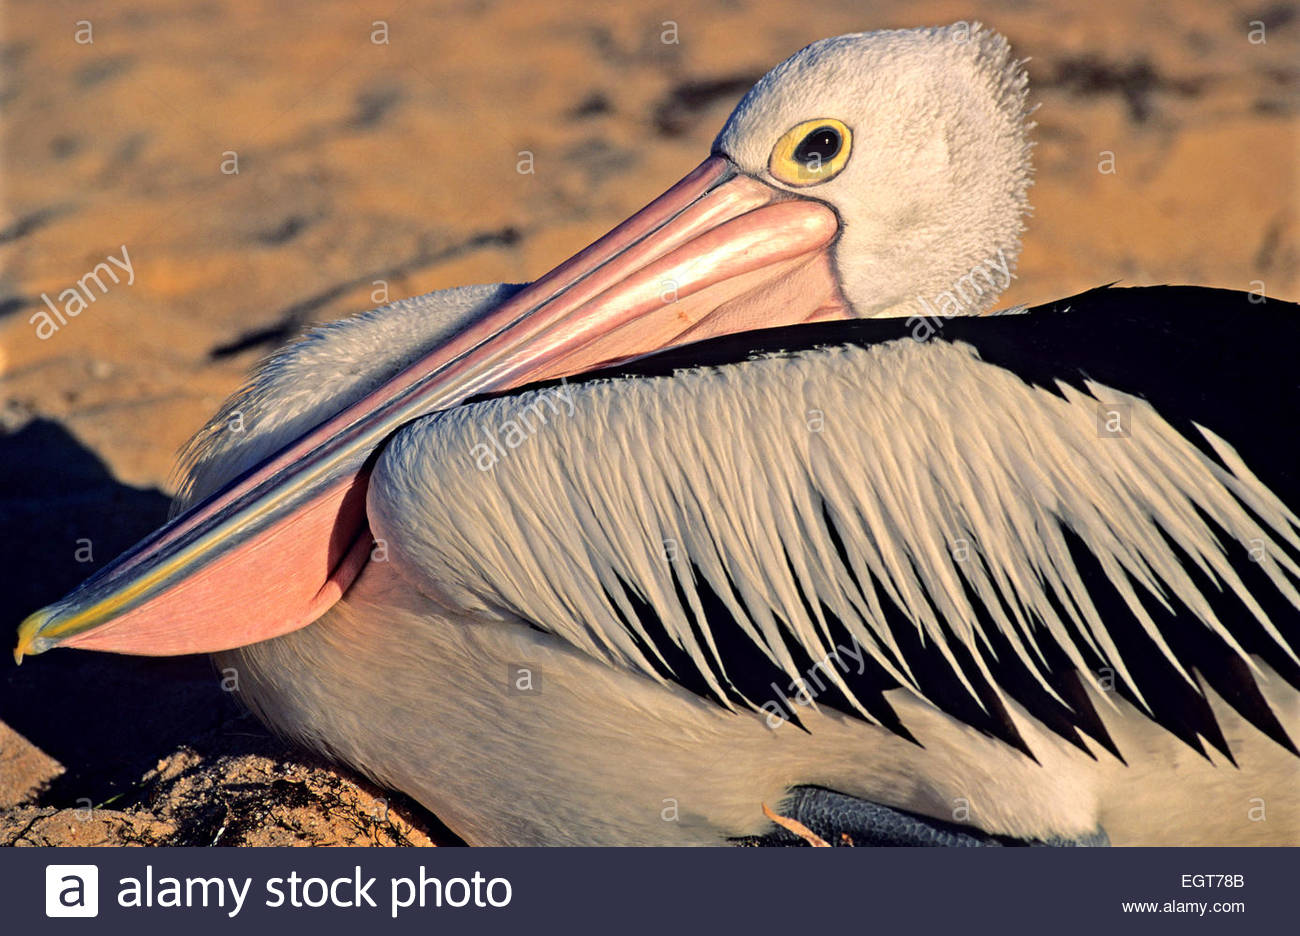 Spectacled pelican, Shark Bay, Australia occidentale. Immagini Stock